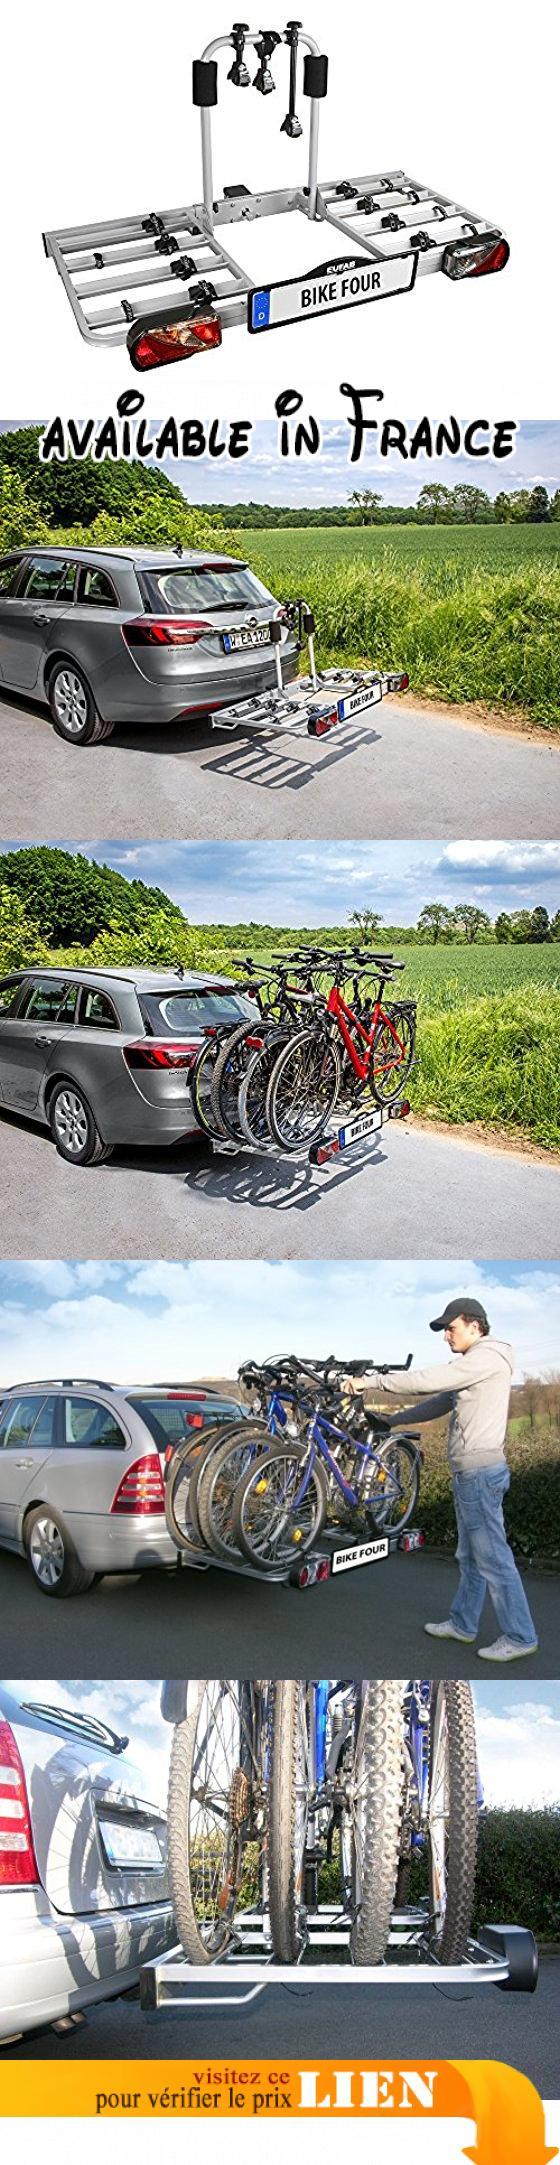 Eufab Bike Four 11437 Porte Vélos Porte Velo 4 Vélos Sur Attelage